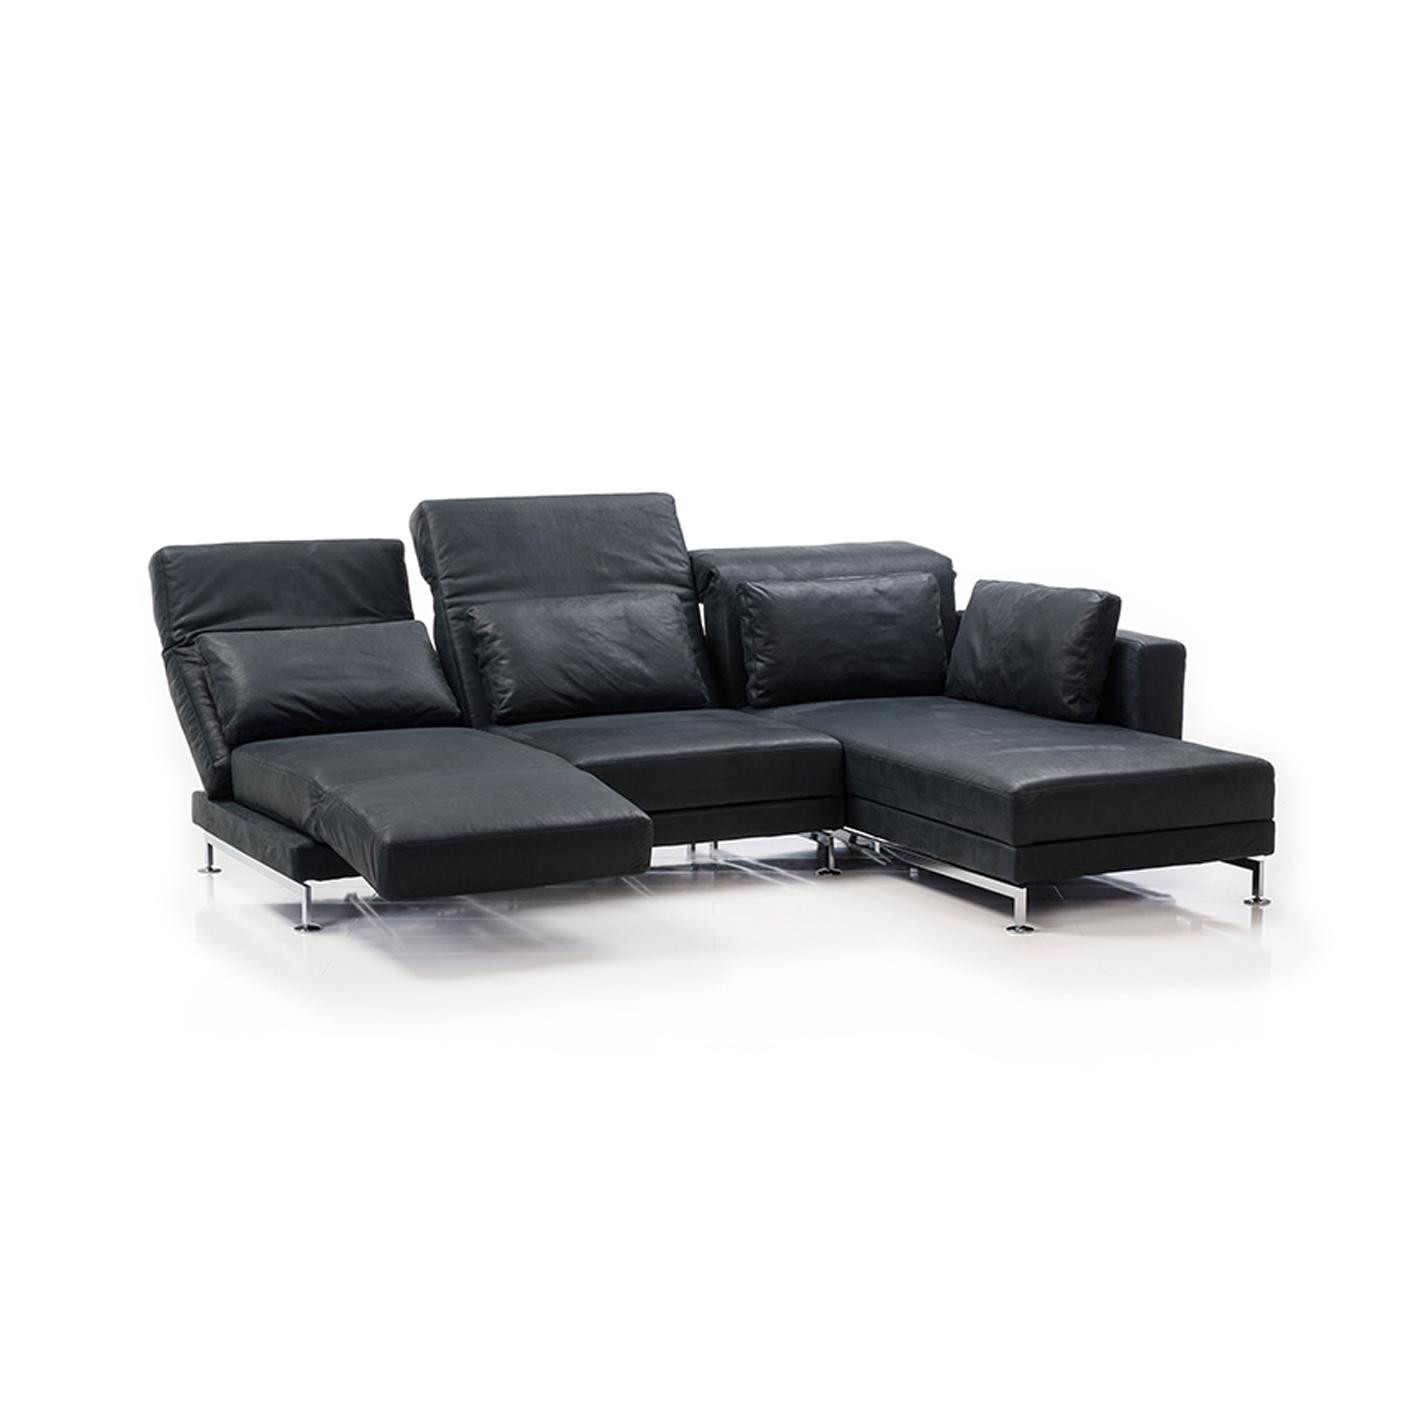 Sofa 3 Bruhl Moule Schlafsofa